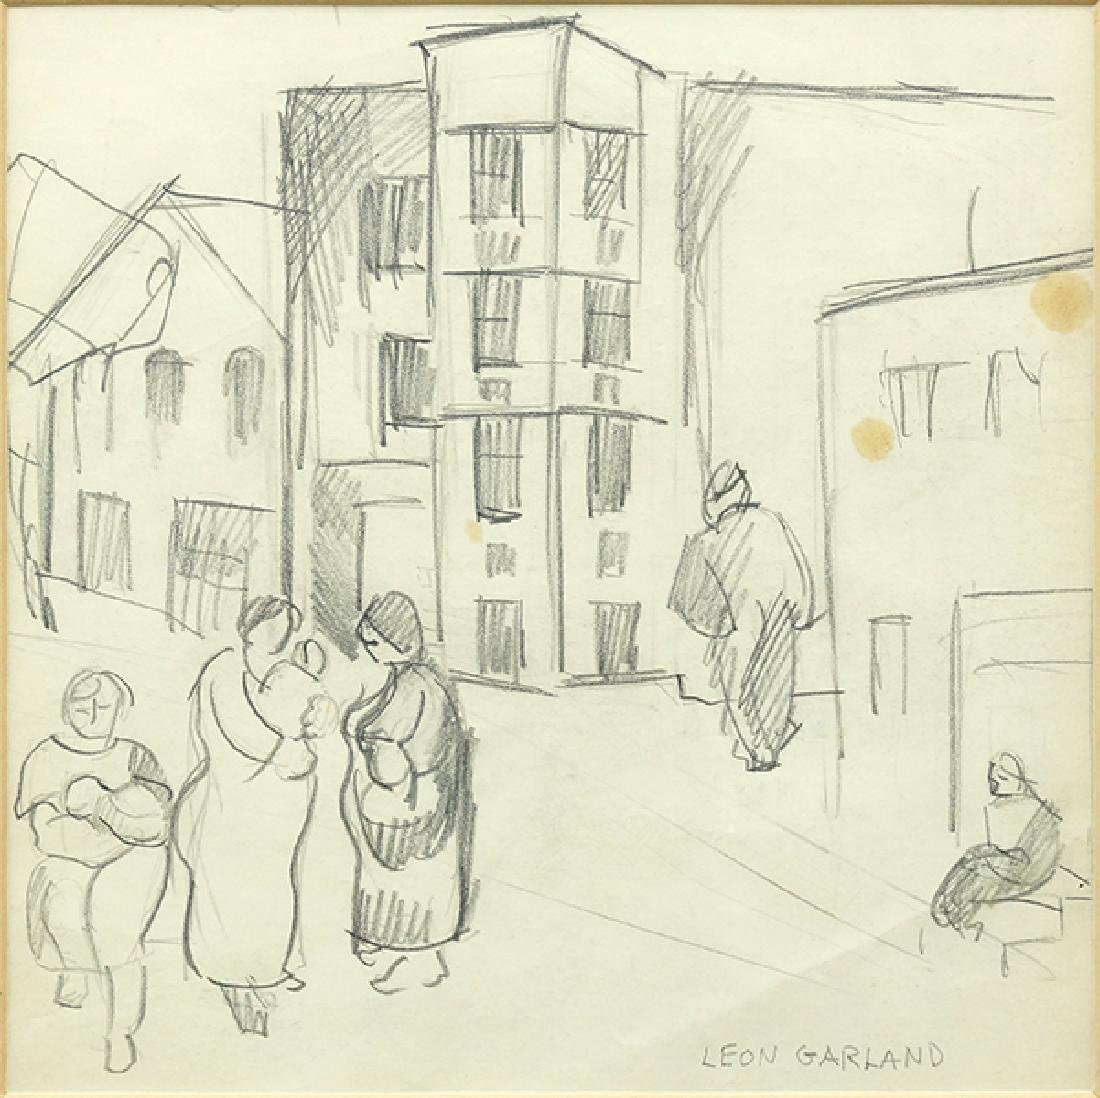 Leon Garland (American, 1896-1941) Town Square.